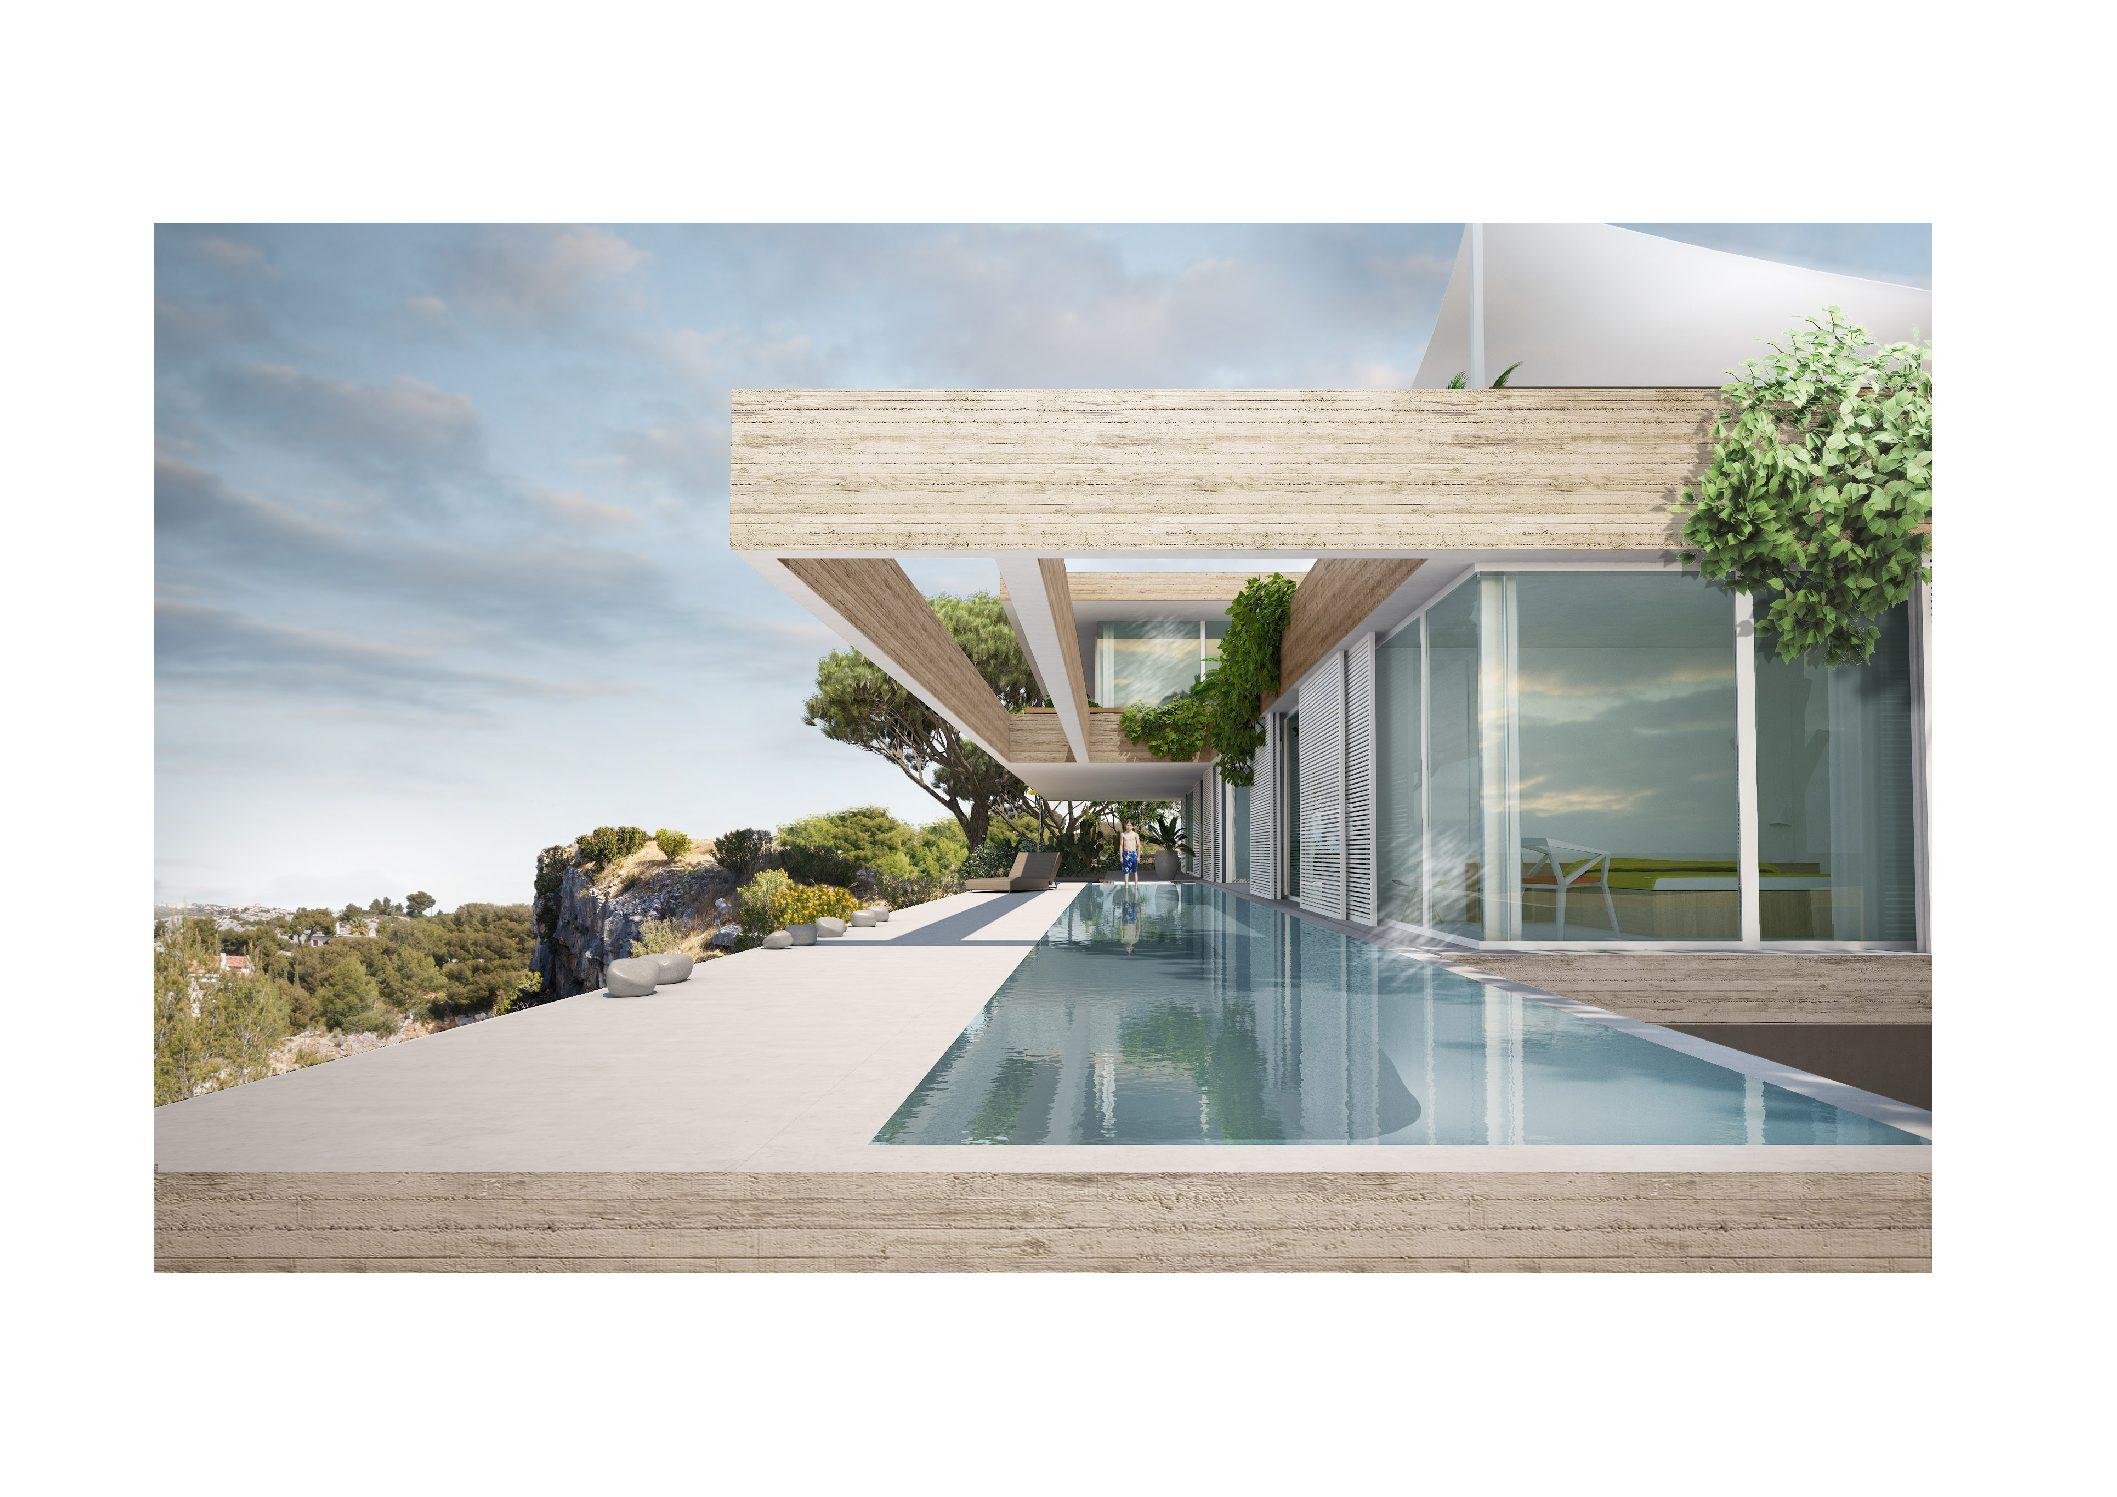 Architecture54_Cassis_01